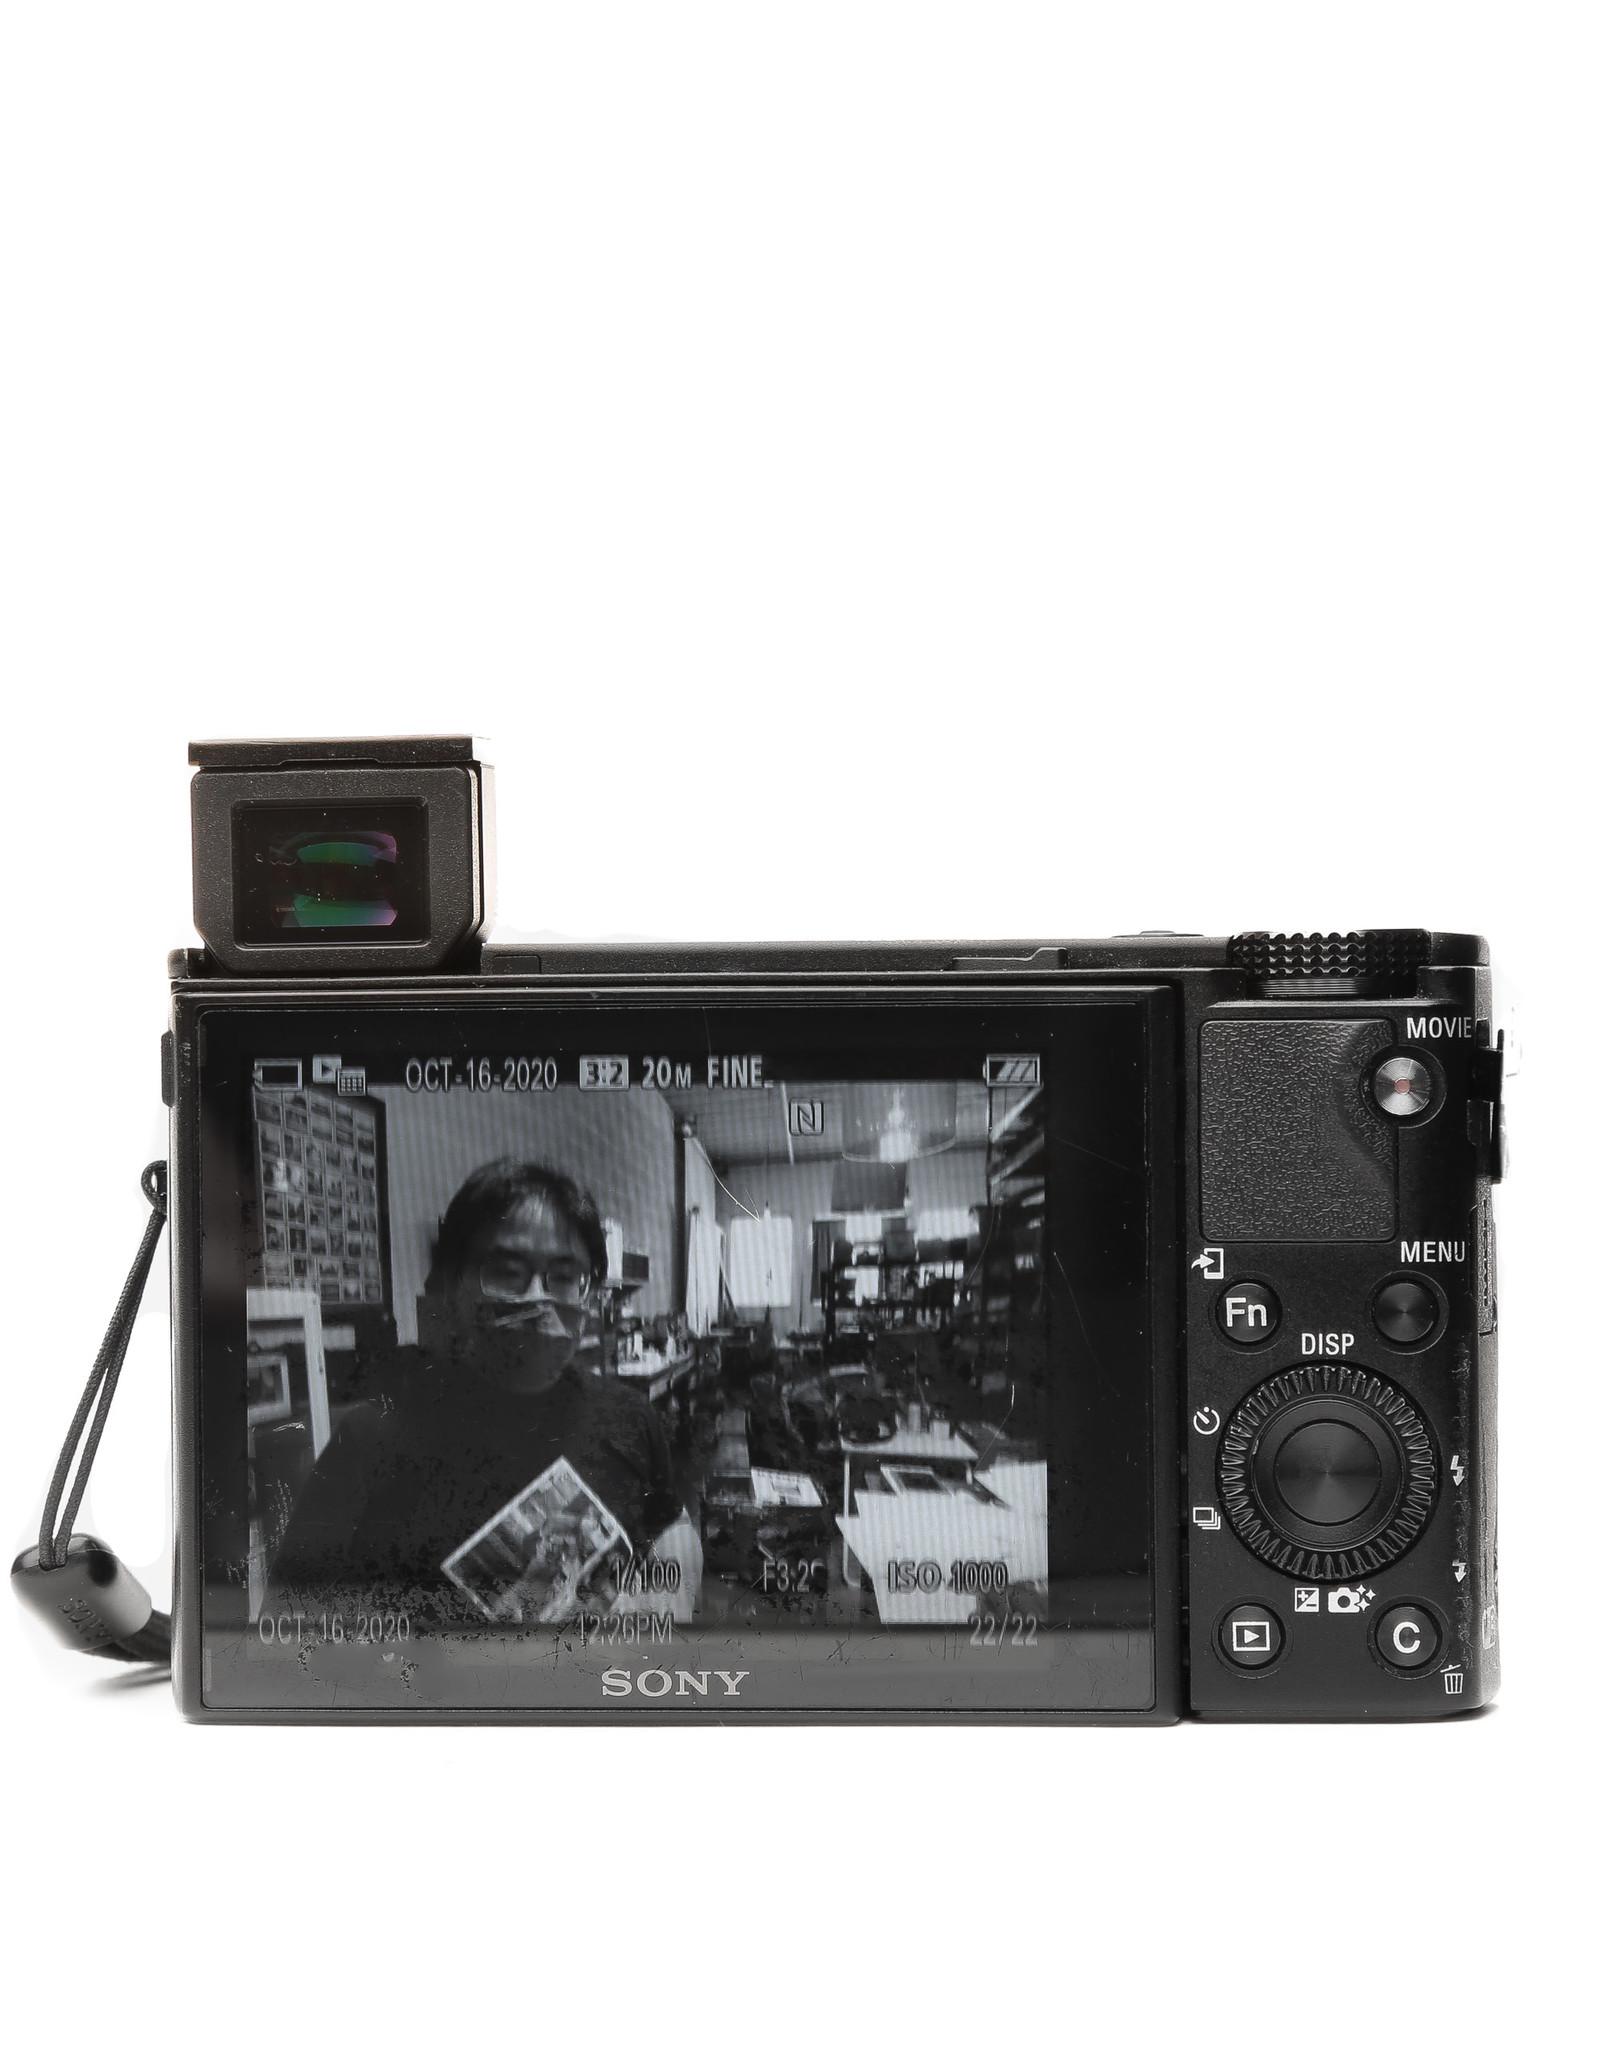 Sony Sony RX-100 III Compact Digital Camera